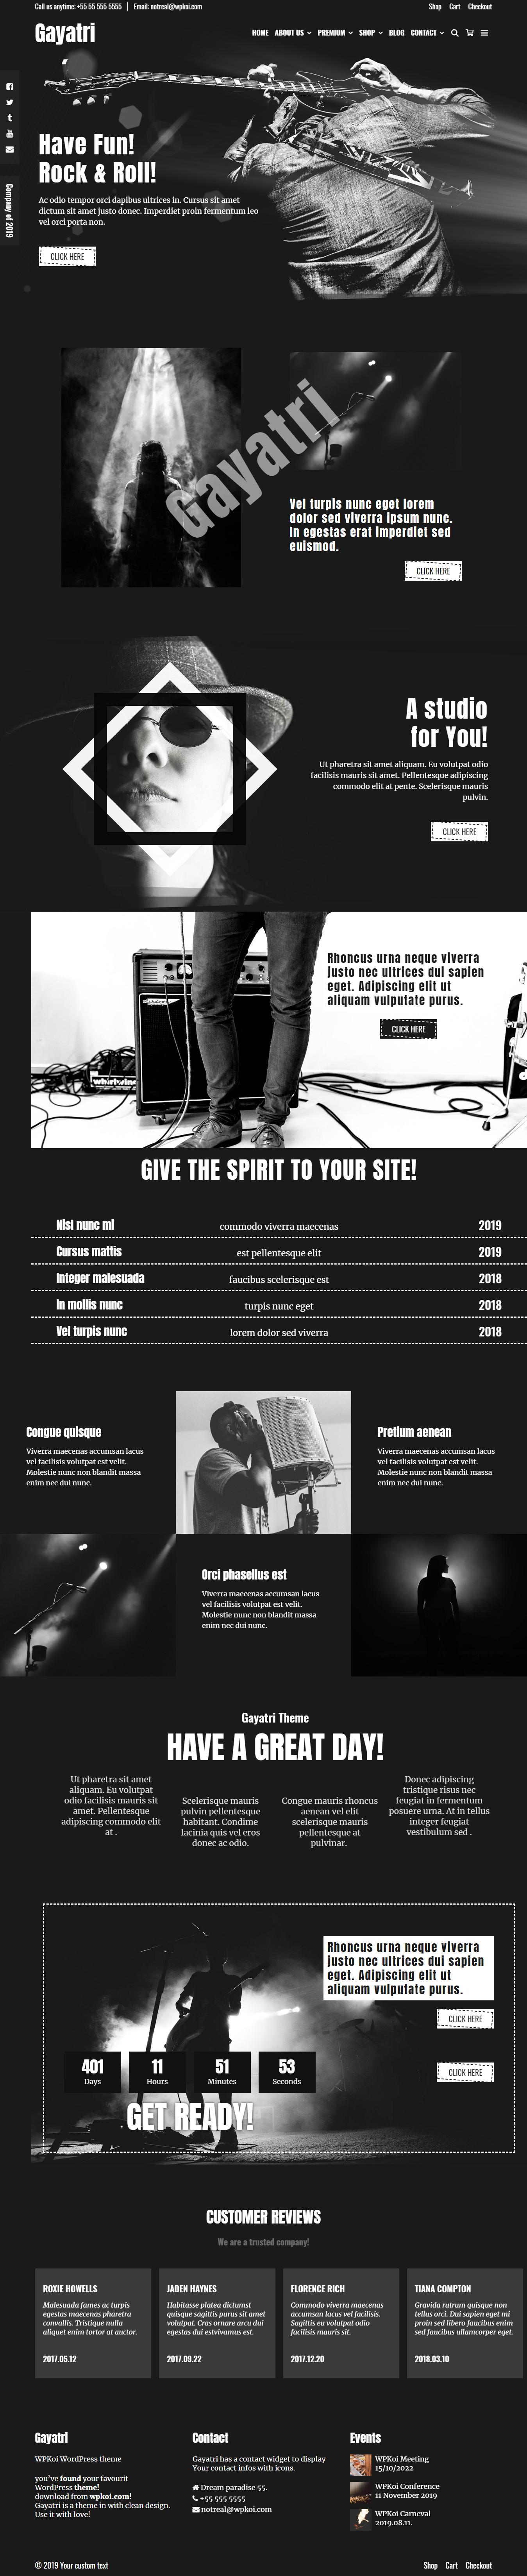 gayatri best free video and music wordpress theme - 10+ Best Free Video and Music WordPress Themes